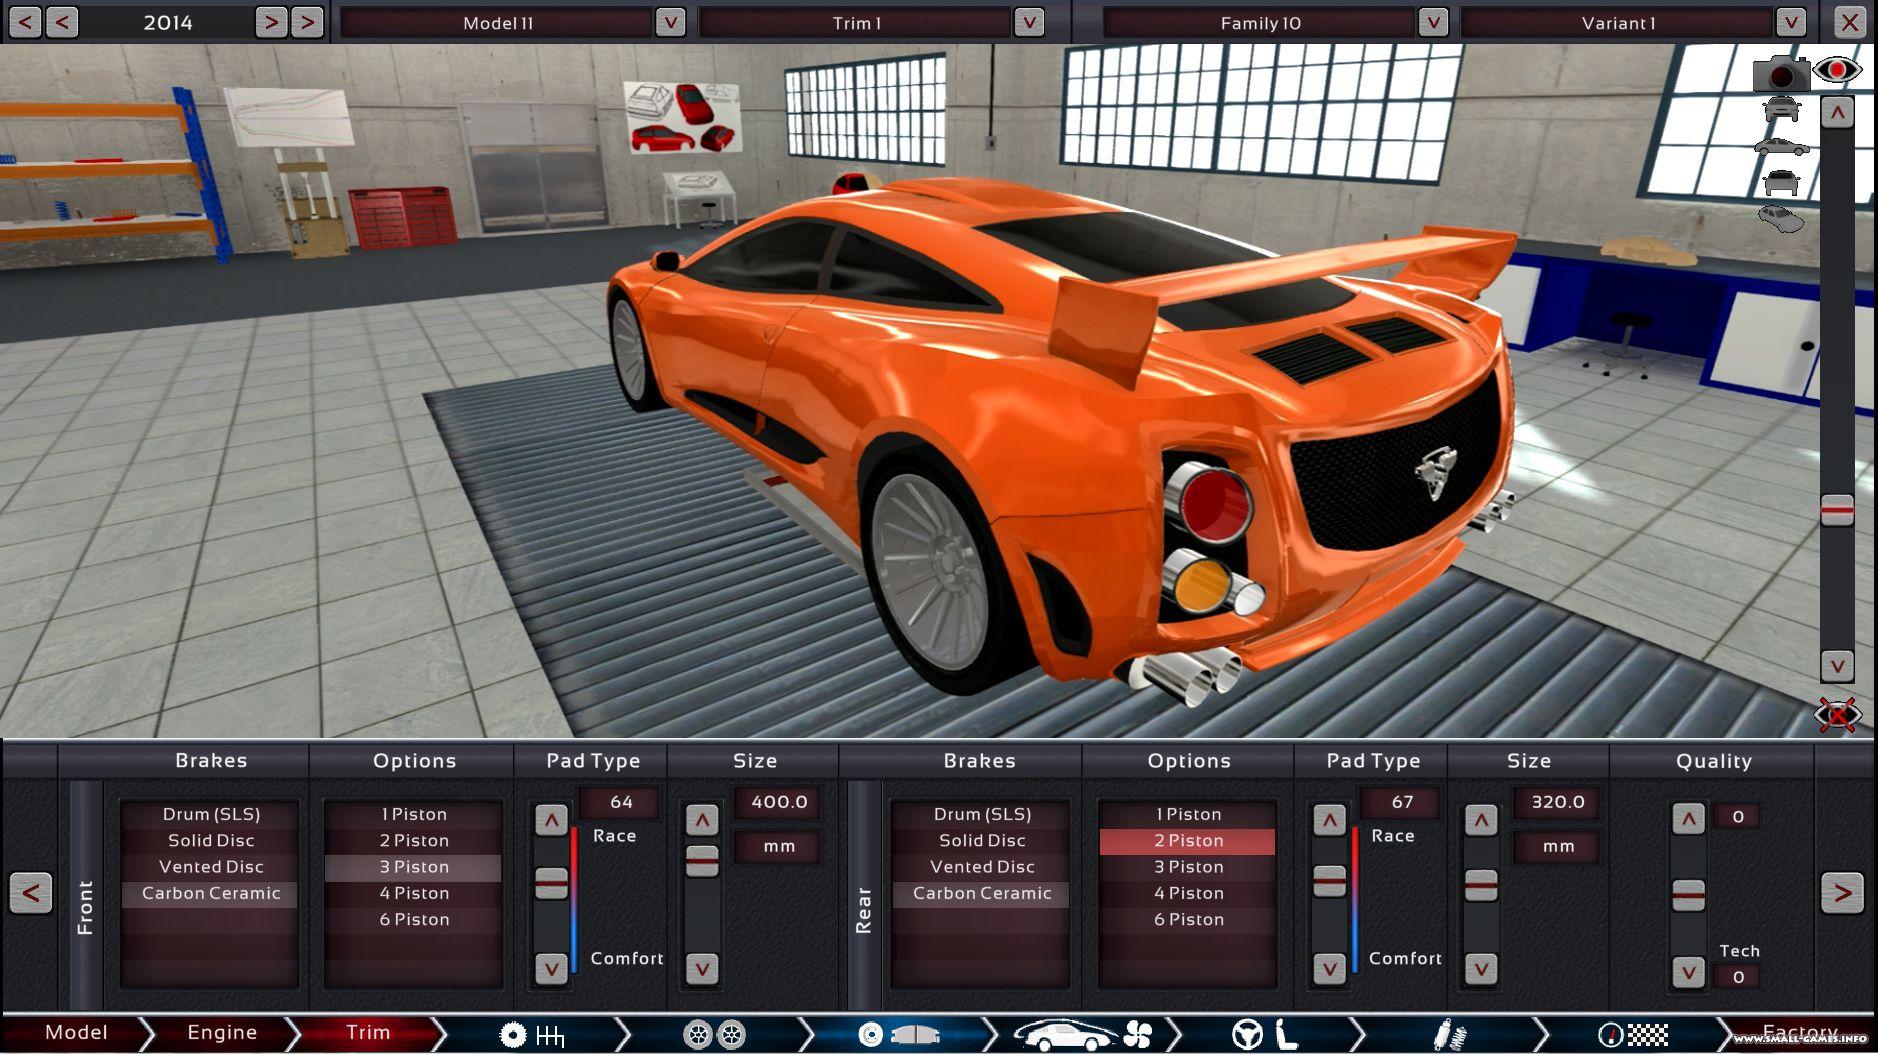 Best Reworked Engine For Build Engine Games